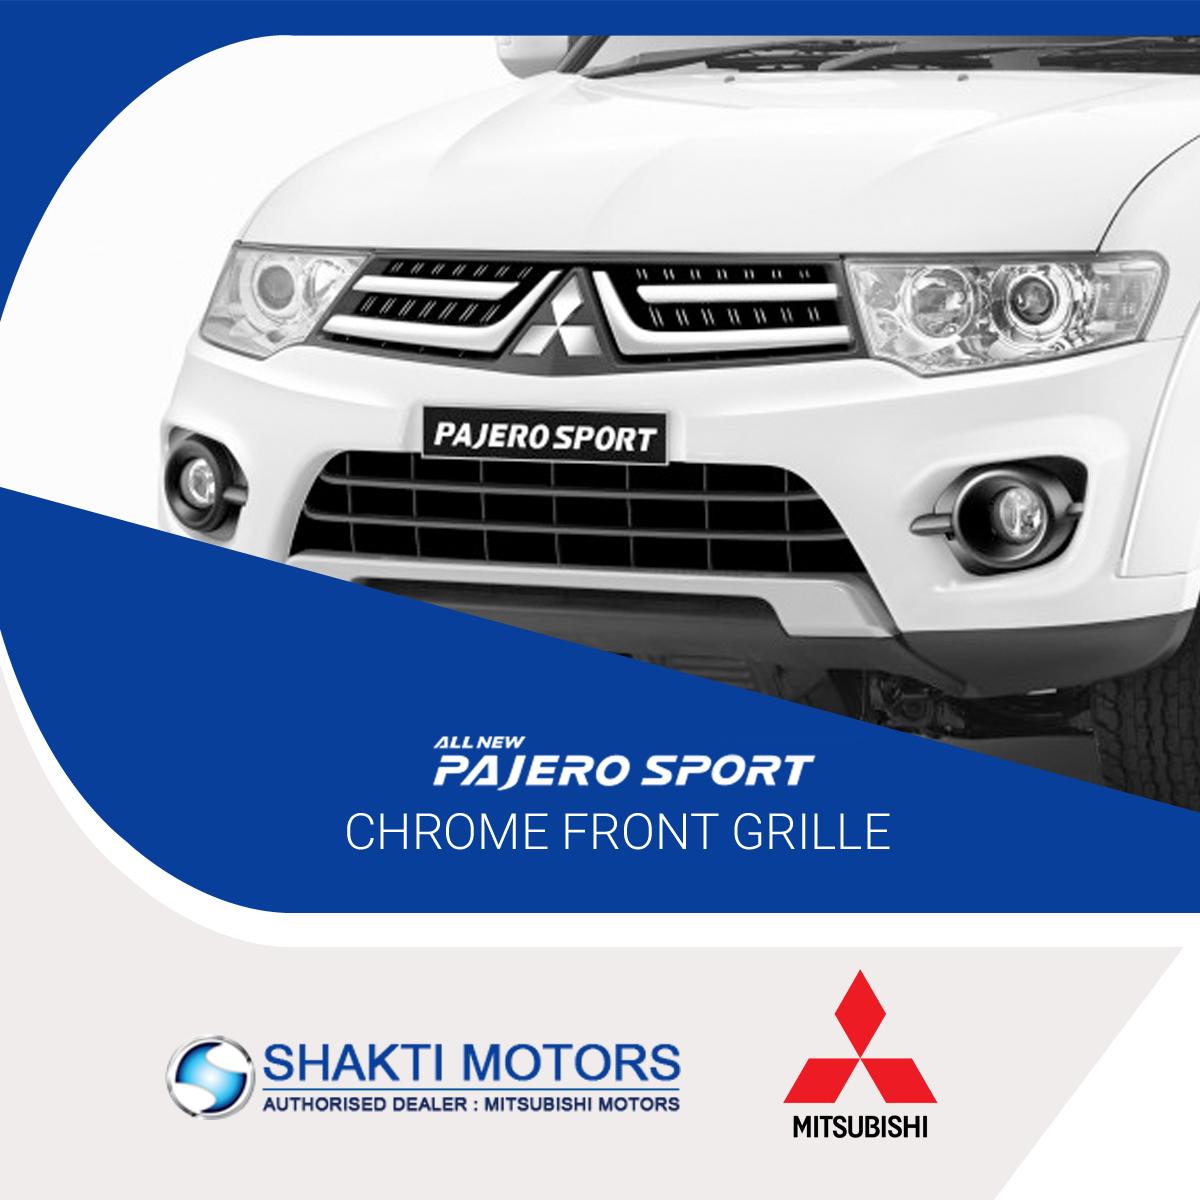 #PajeroSports Chrome Front Grille #ShaktiMotors: https://goo.gl/Lg8QAr #Pajero #Mitsubishi #MitsubishiPajero #SmartSUV #SUVCar #MyCar